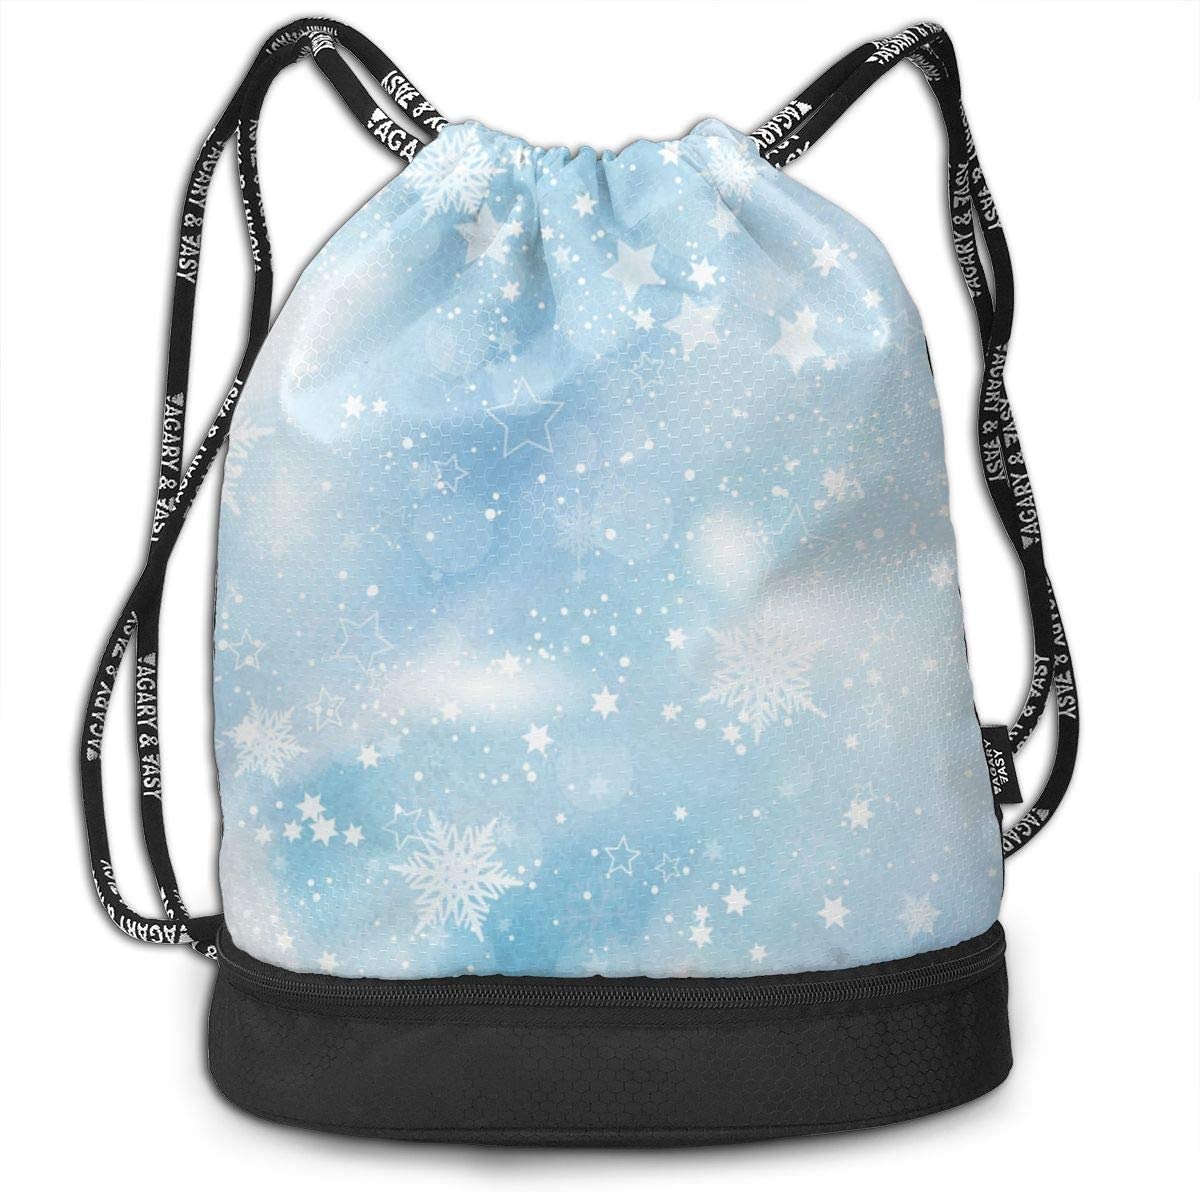 HUOPR5Q Giraffe Family Drawstring Backpack Sport Gym Sack Shoulder Bulk Bag Dance Bag for School Travel